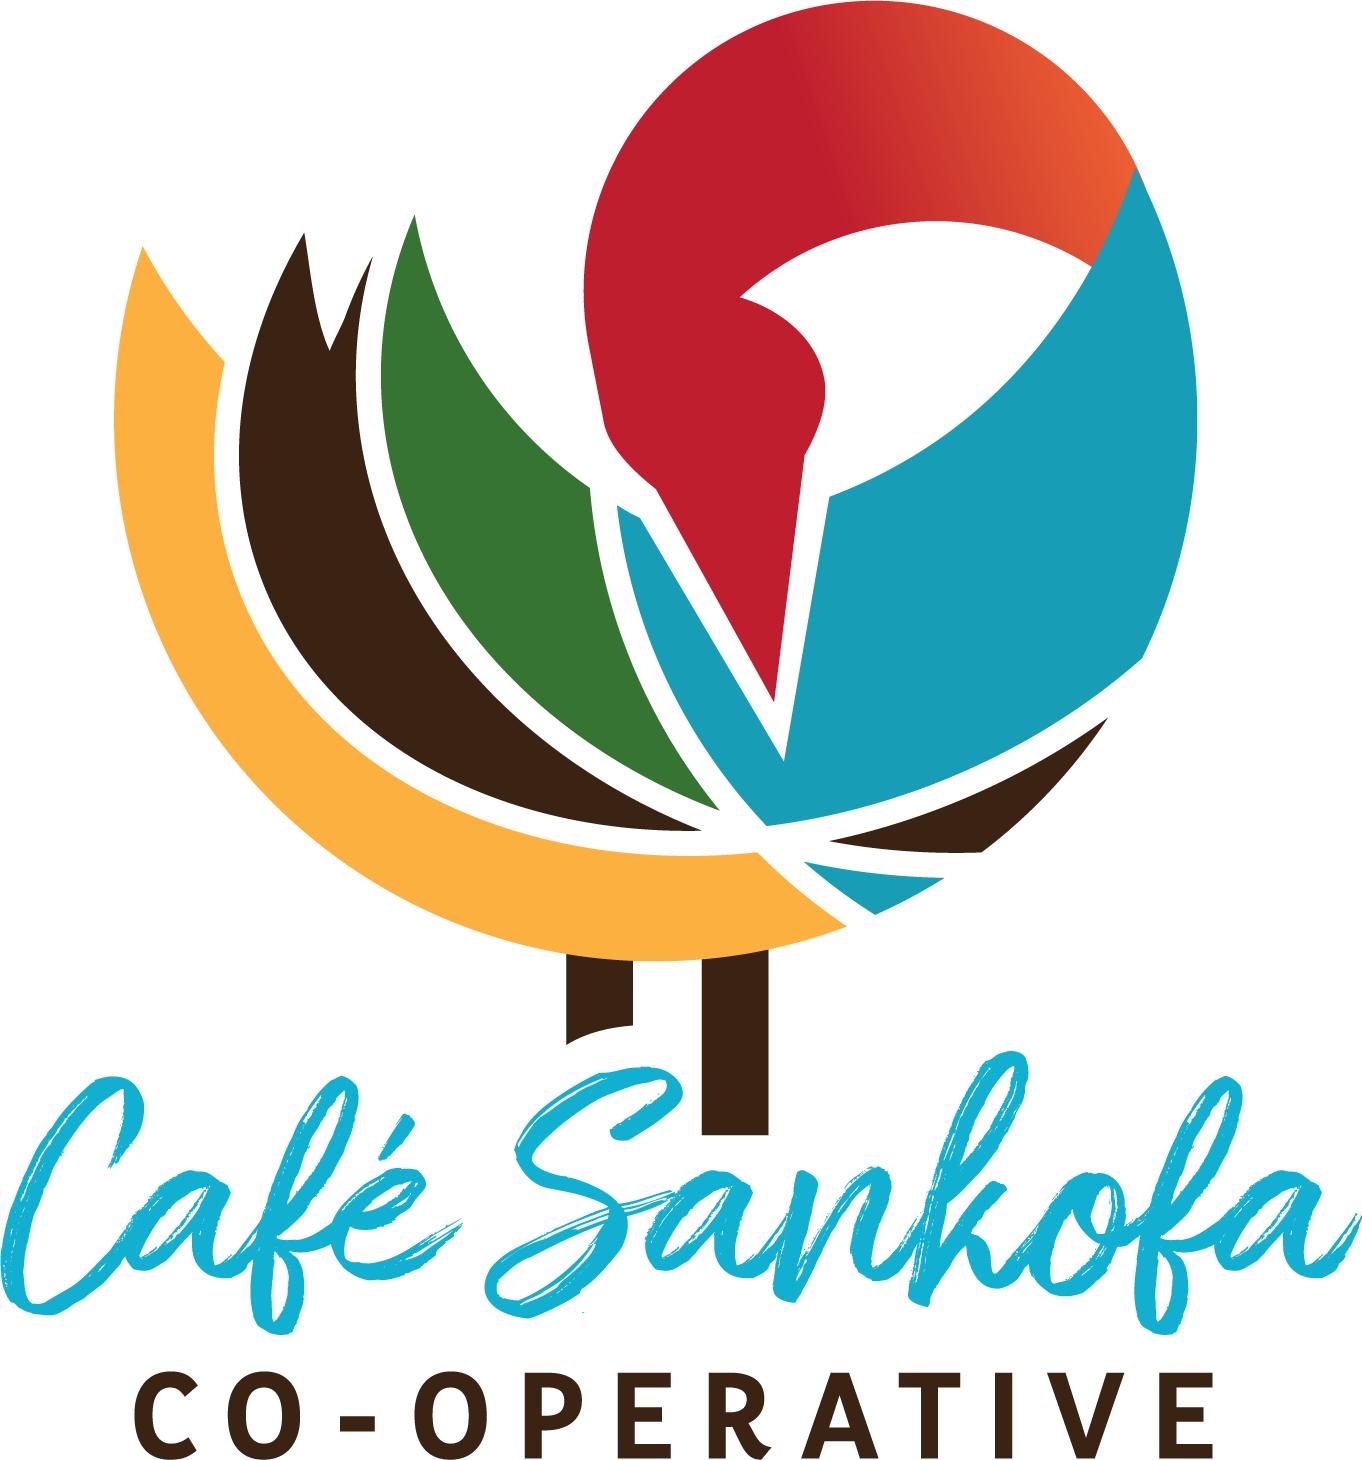 Cafe Sankofa